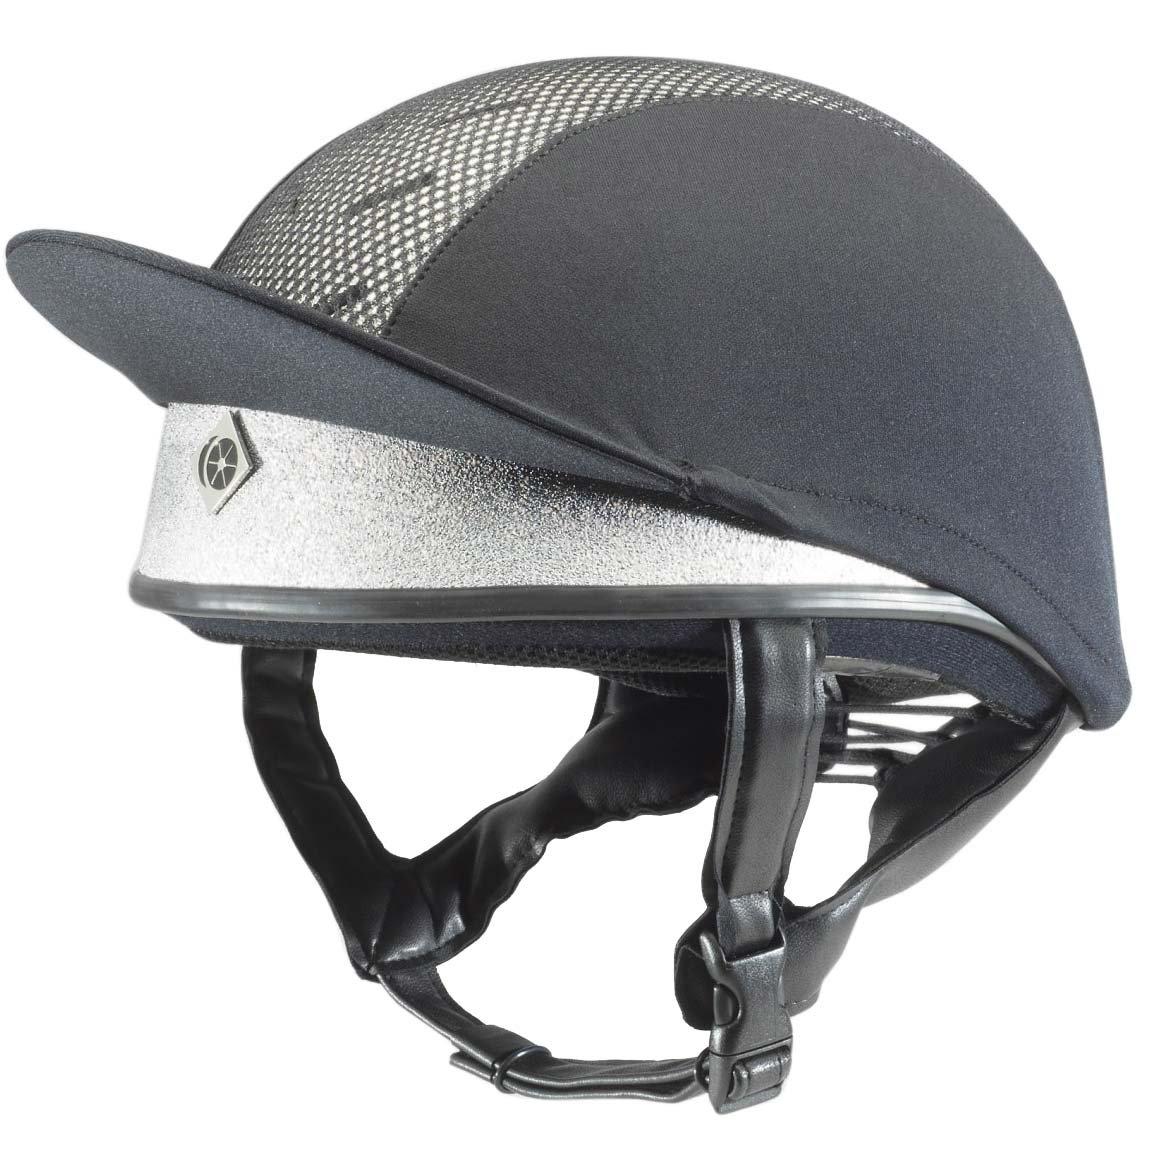 Charles Owen Pro II Skull Helmet